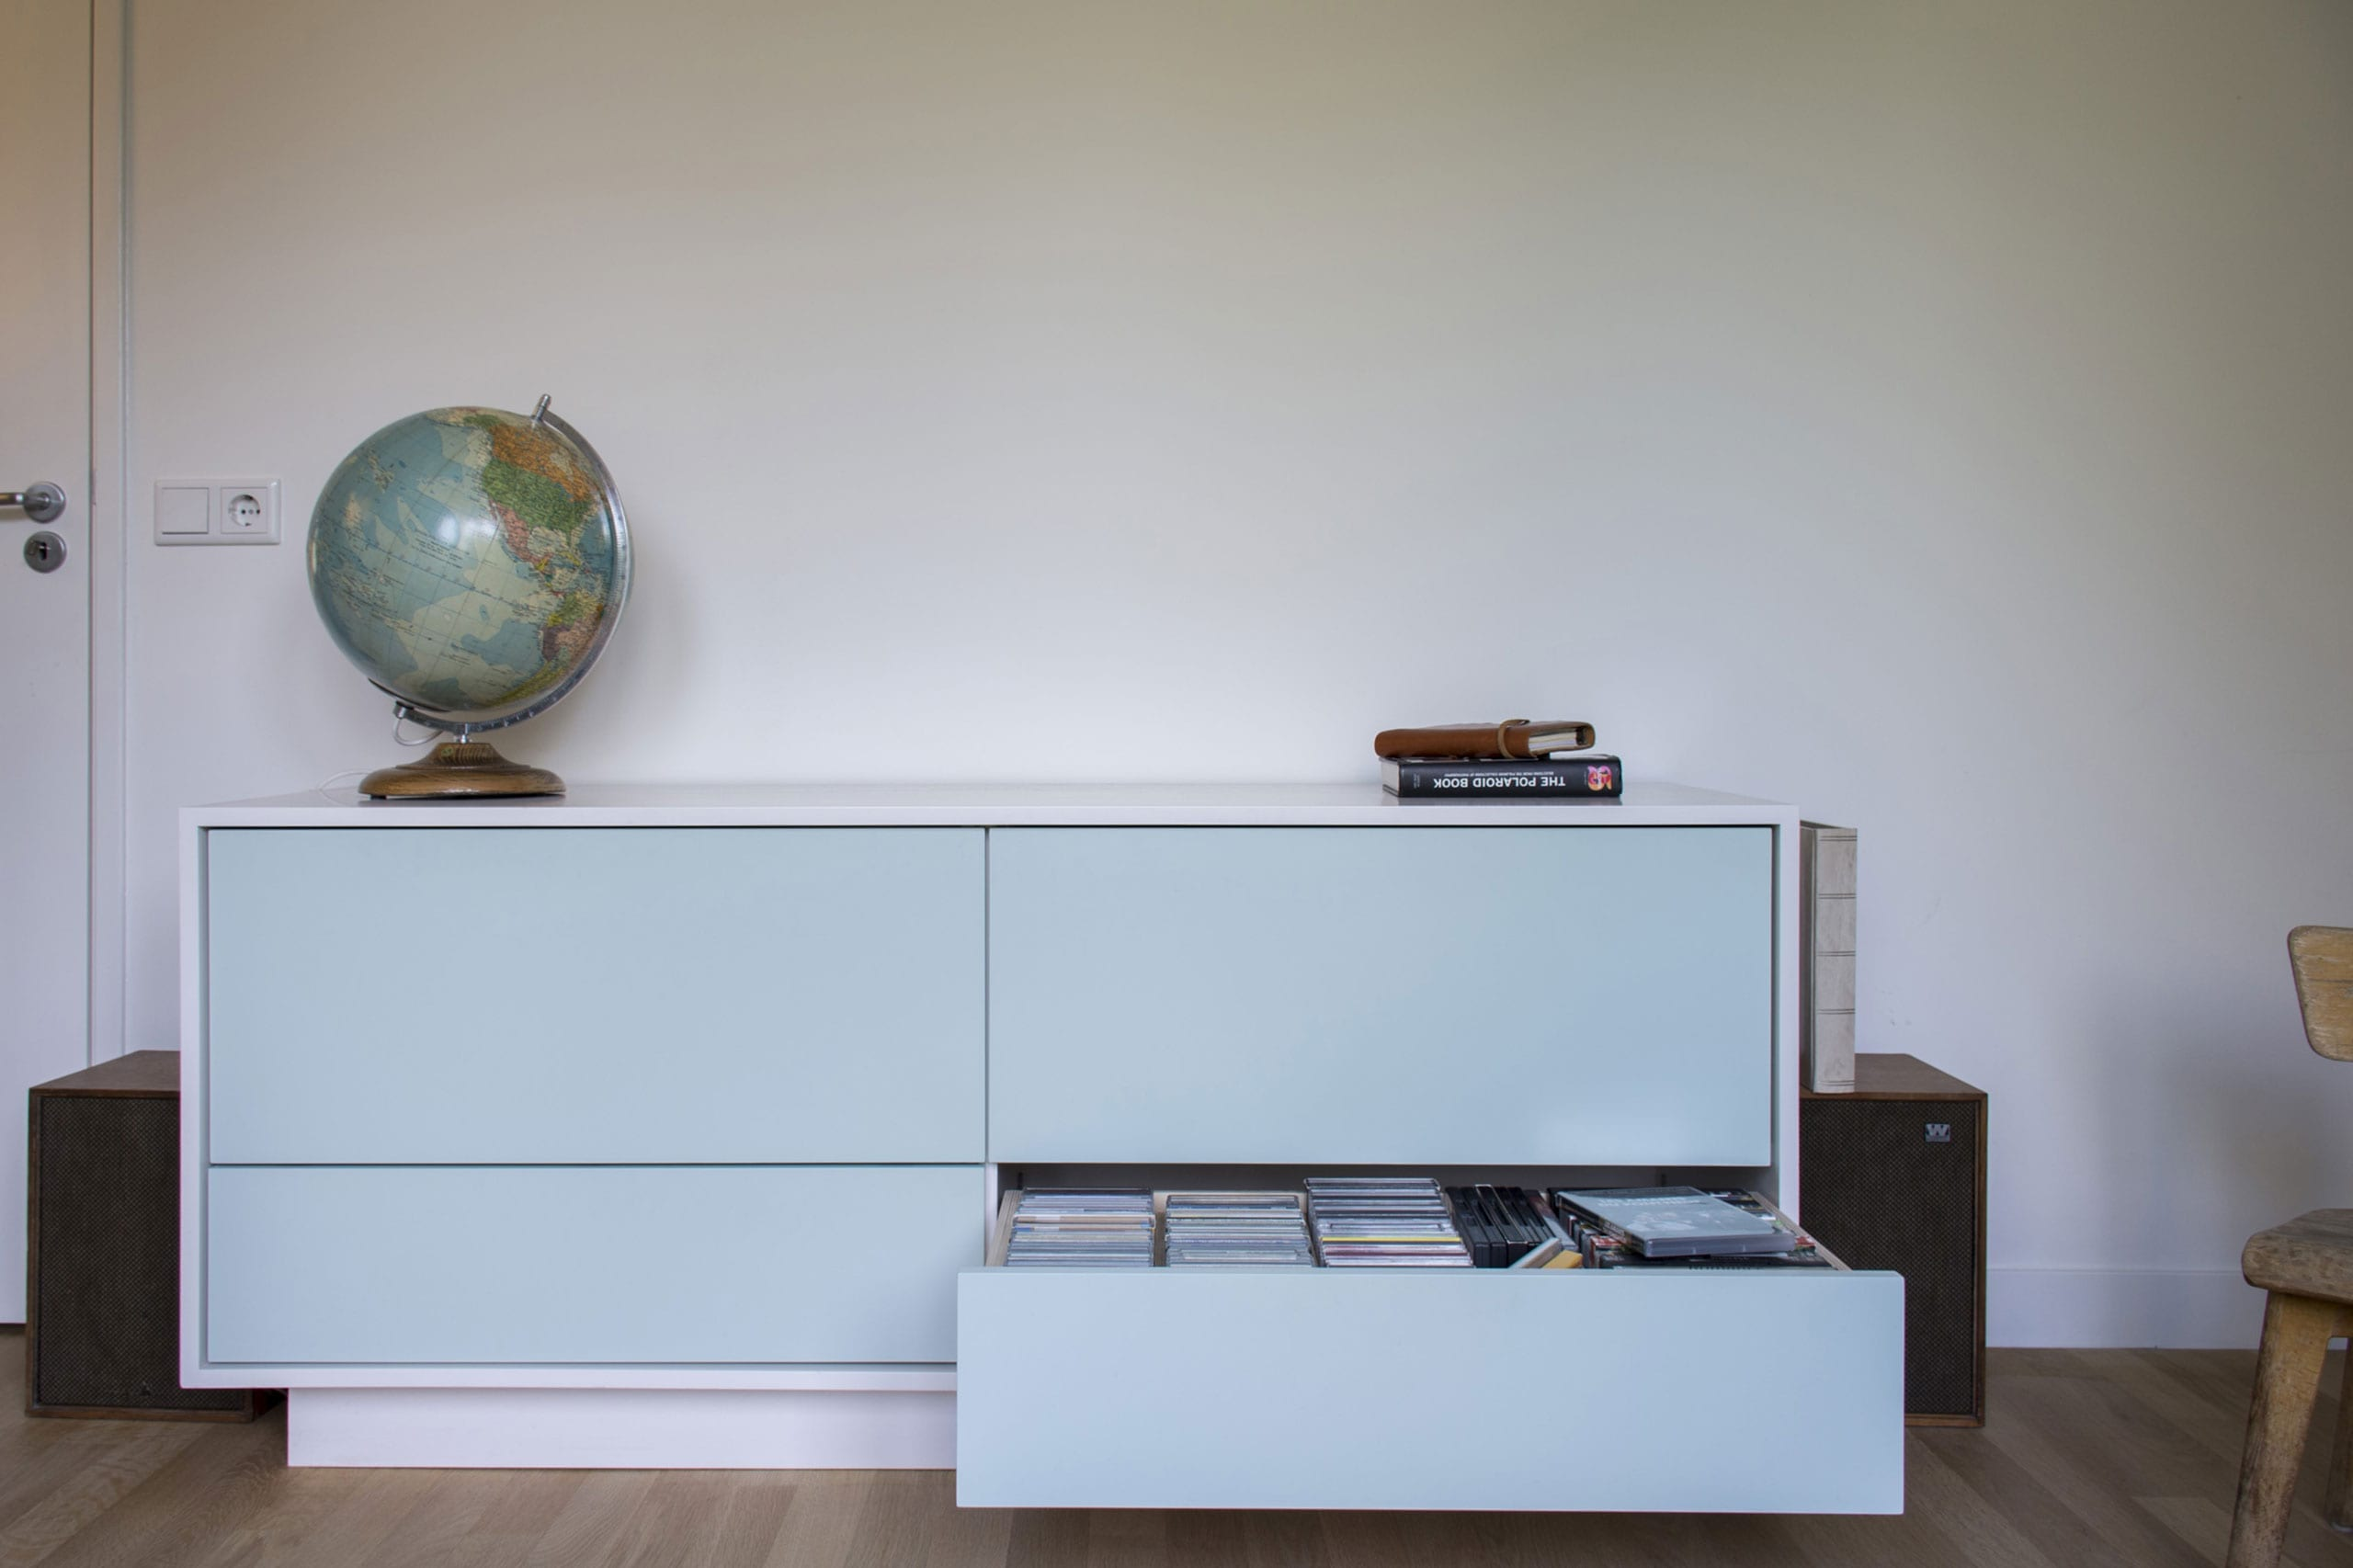 gespoten-dressoir-woonkamer-ontwerp-op-maat